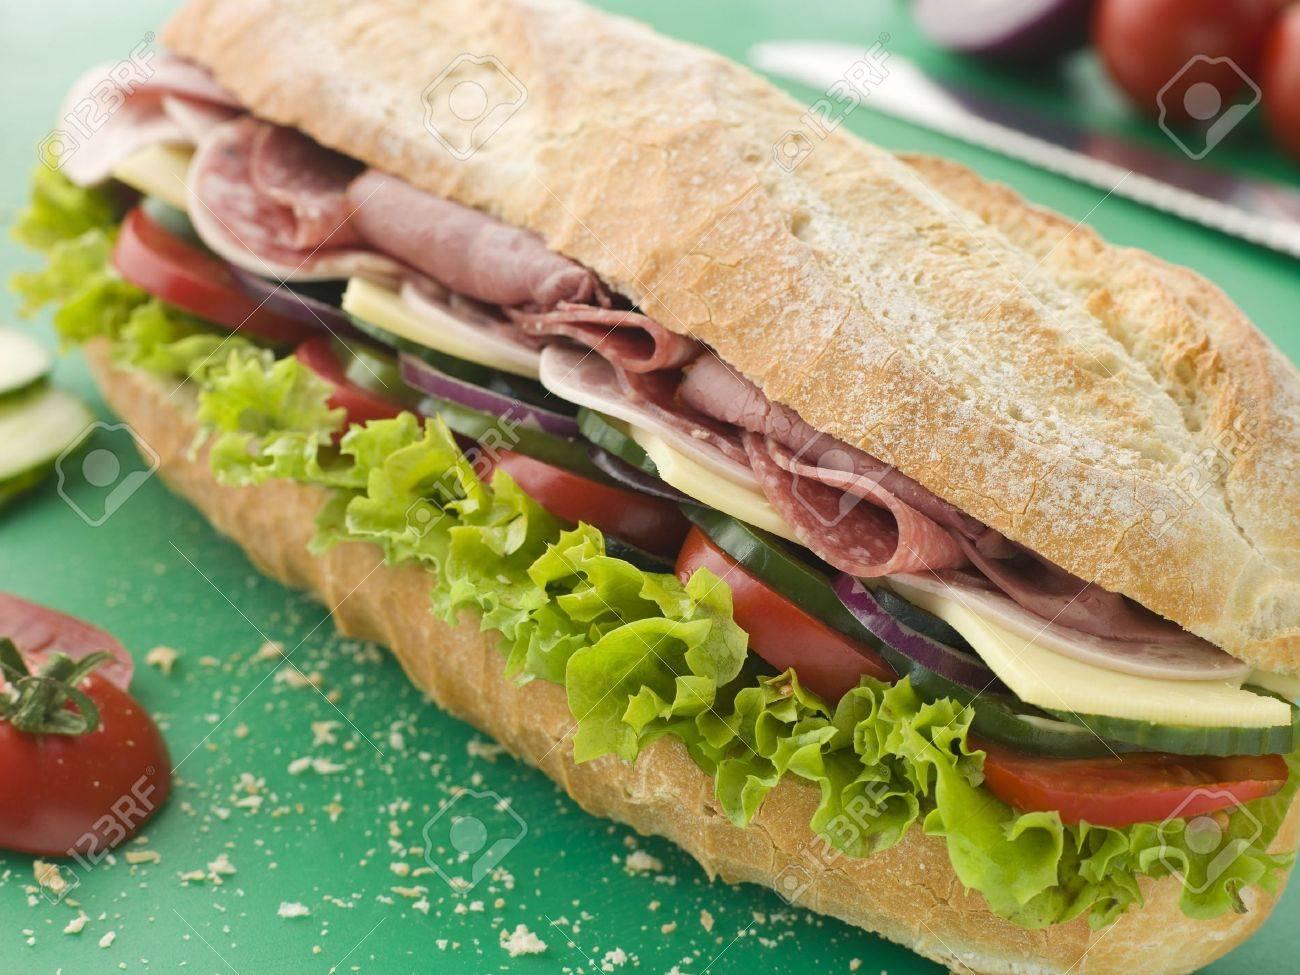 Deli Sub Sandwich on a Chopping Board Stock Photo - 3443931